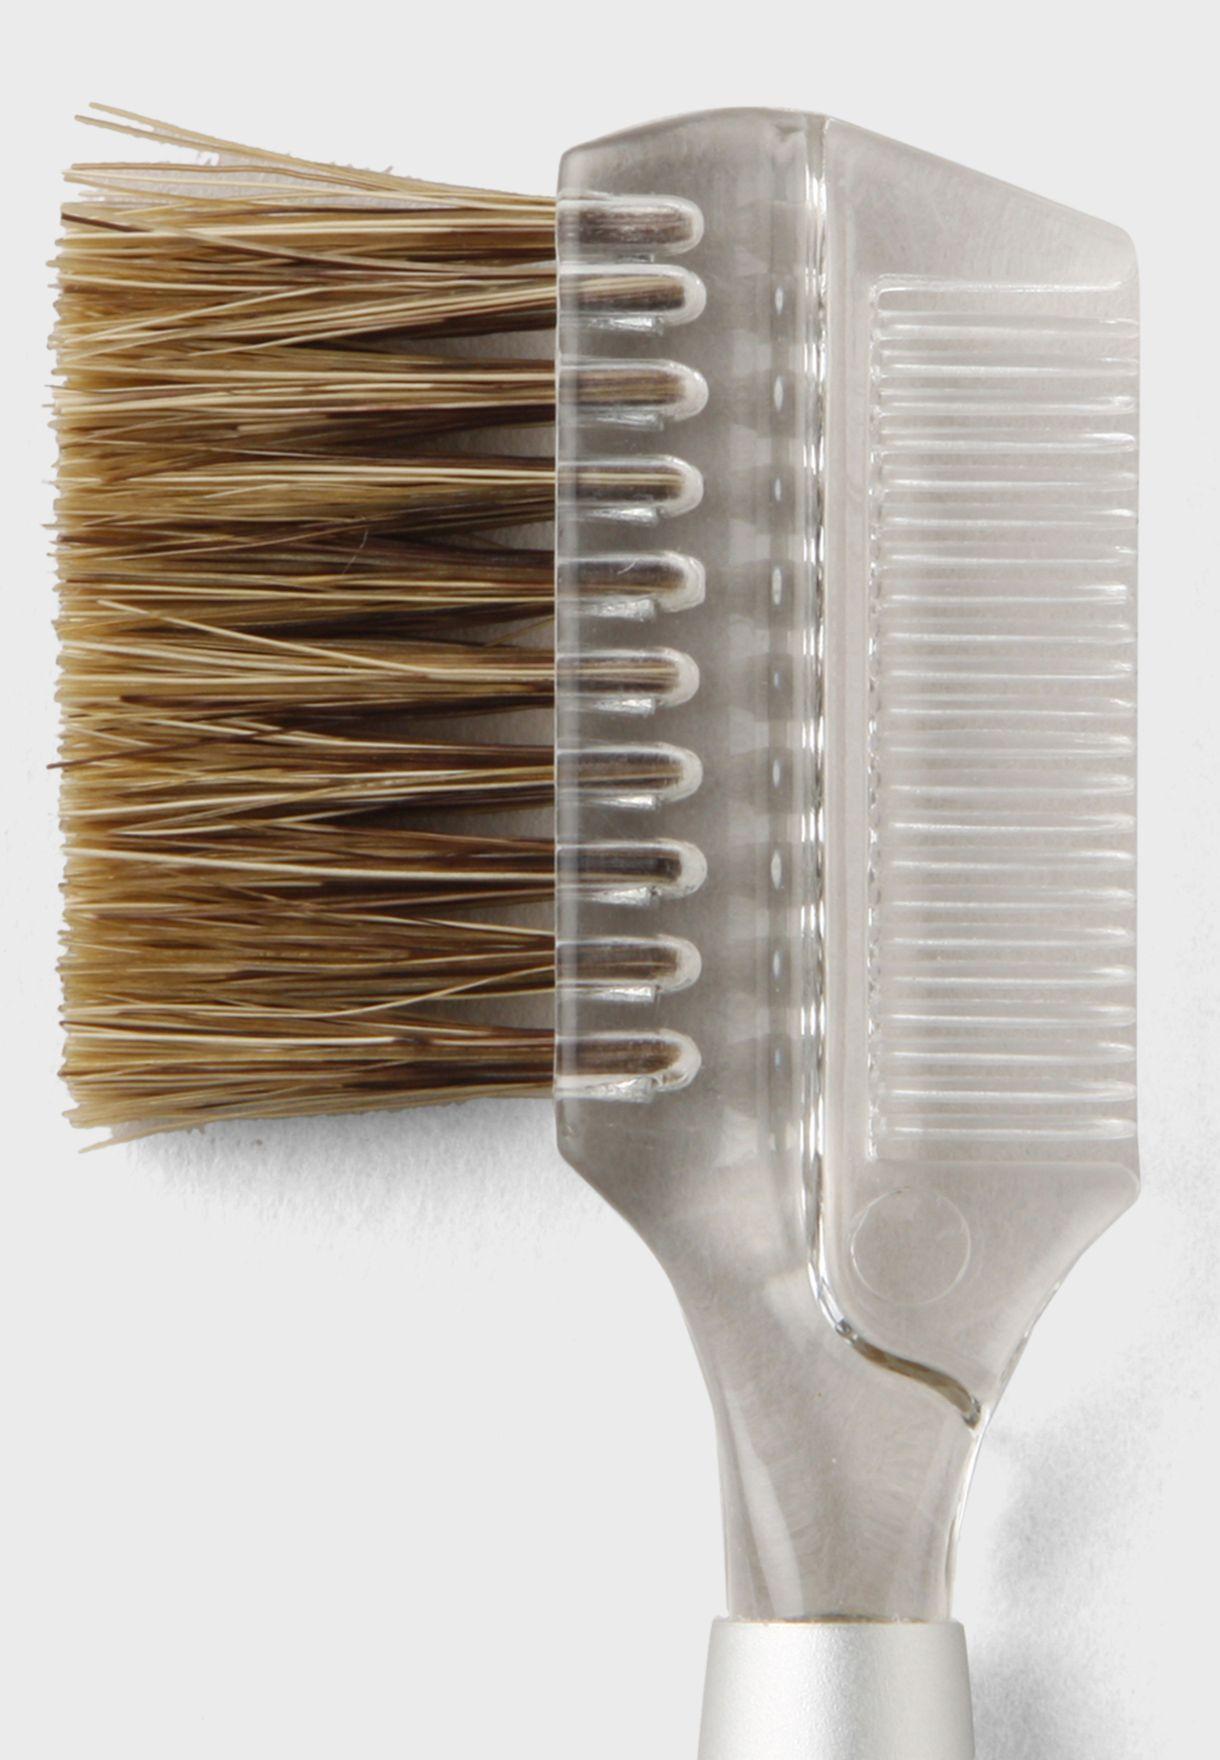 Eyebrow Brush Comb - 128Mm